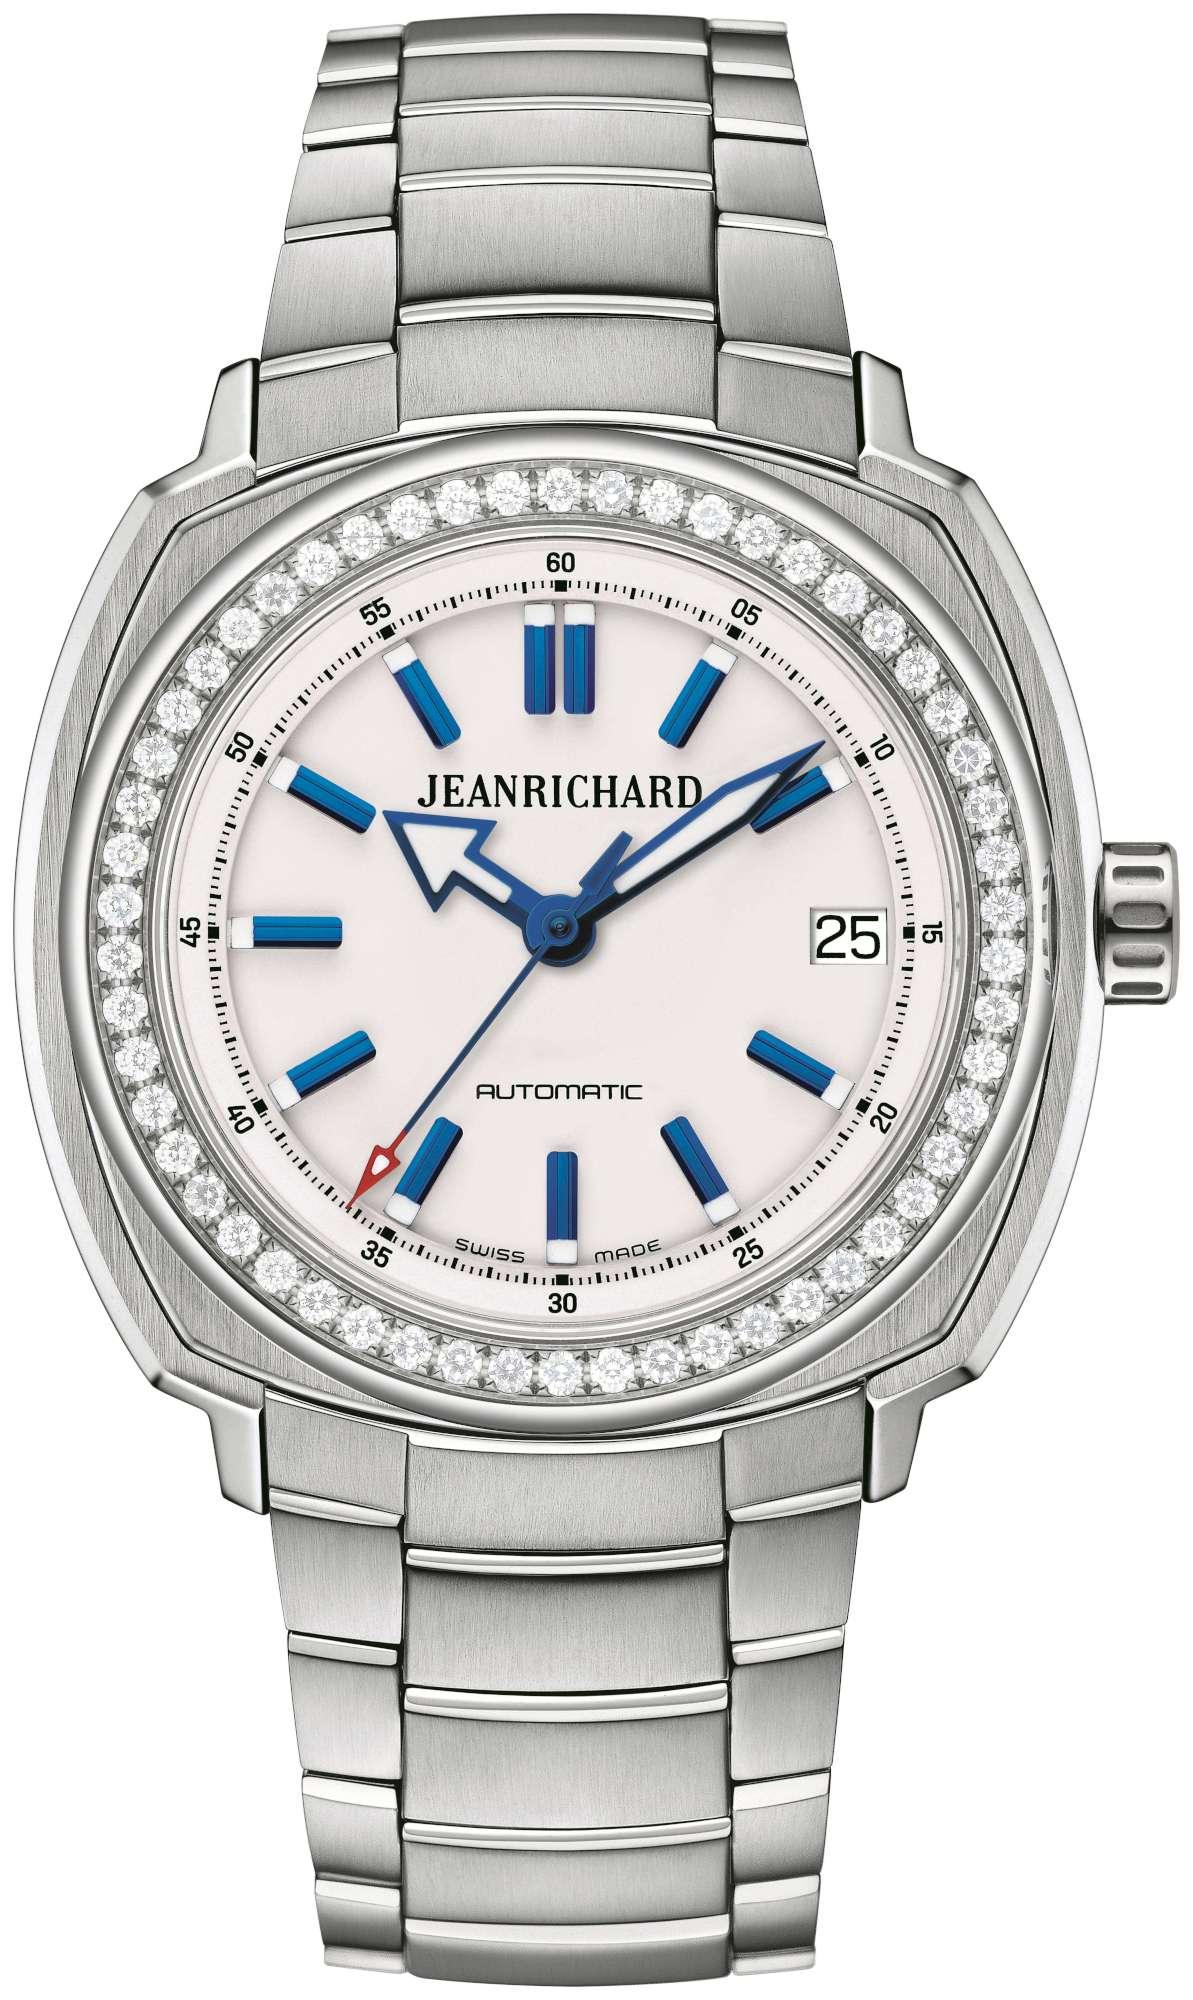 Jeanrichard Terrascope, Reference 60510D11A702-11A, €4,700